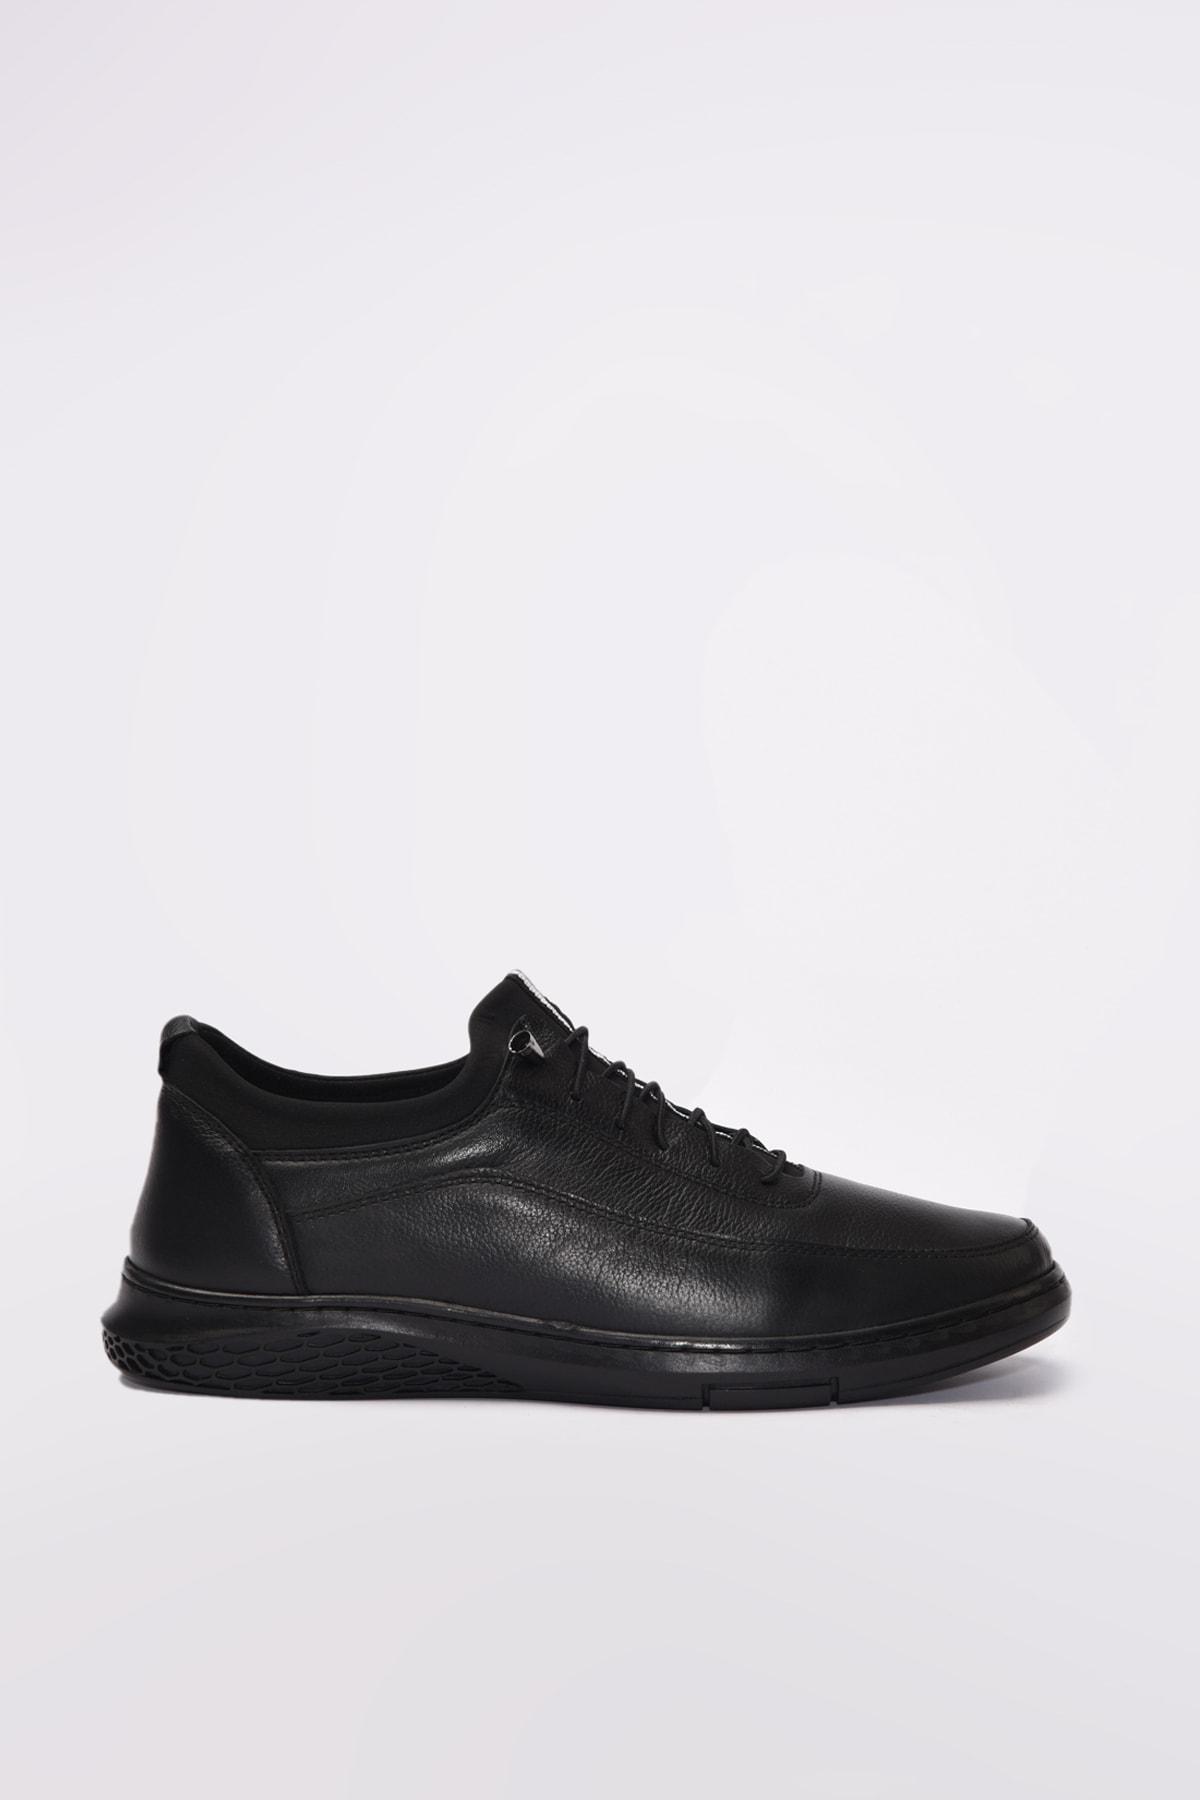 Yaya by Hotiç Hakiki Deri Siyah Erkek Sneaker 02AYY189610A100